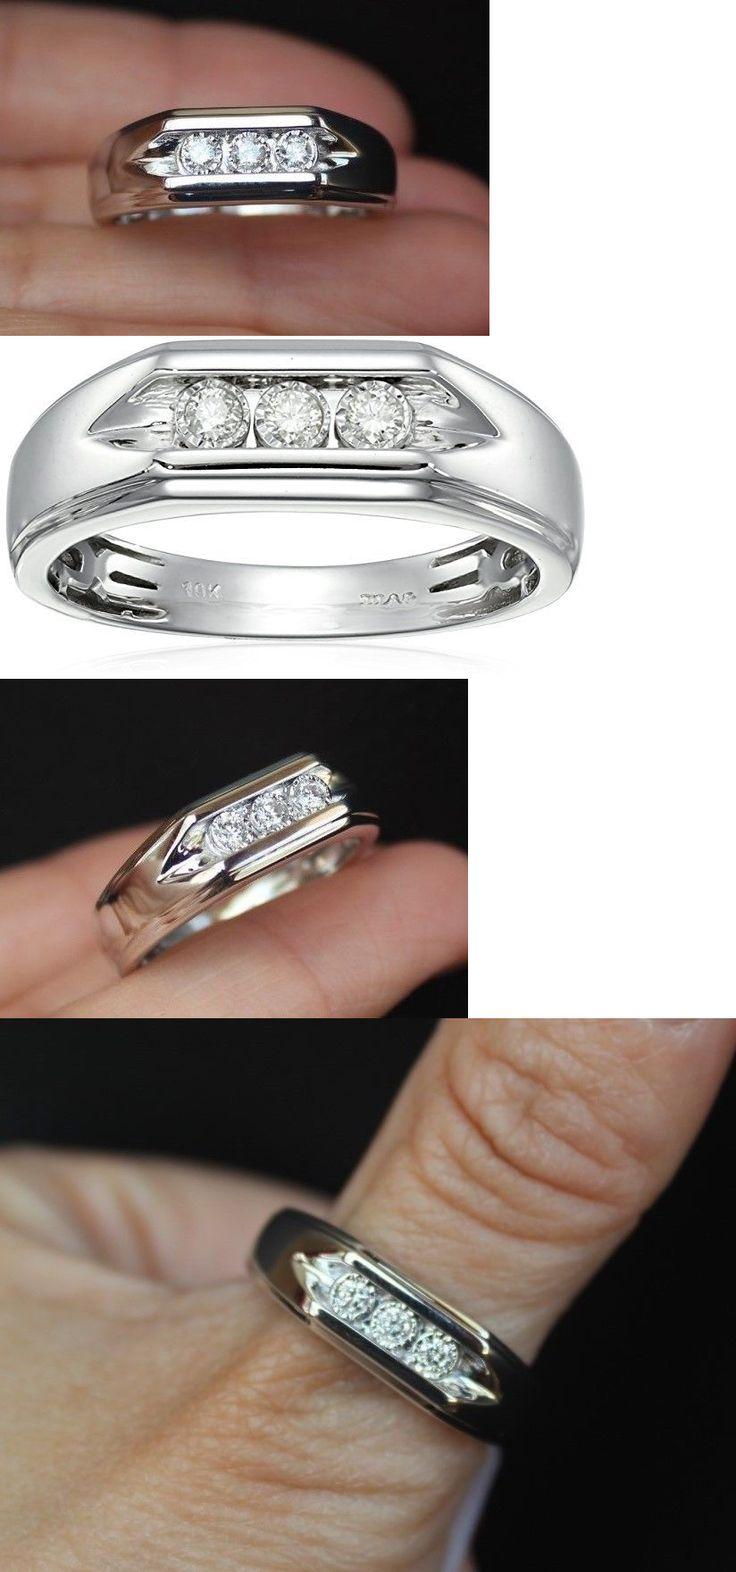 Rings 137856: New 10k Sz 105 Mens Natural Diamond 3 Stone Wedding Band Ring  White